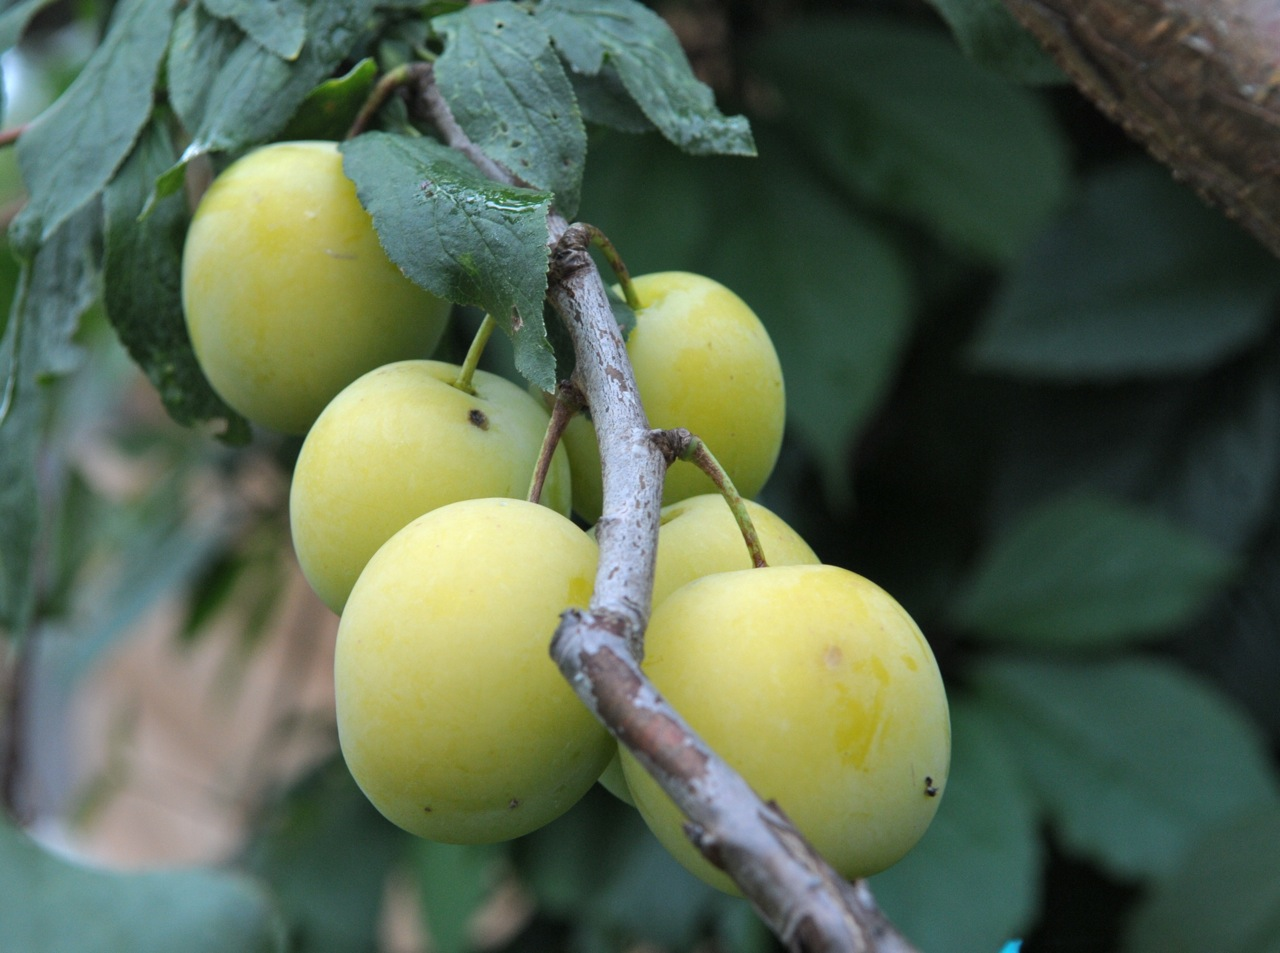 Дерево алыча (слива): фото, названия, описание, уход весной, вредители и болезни алычи